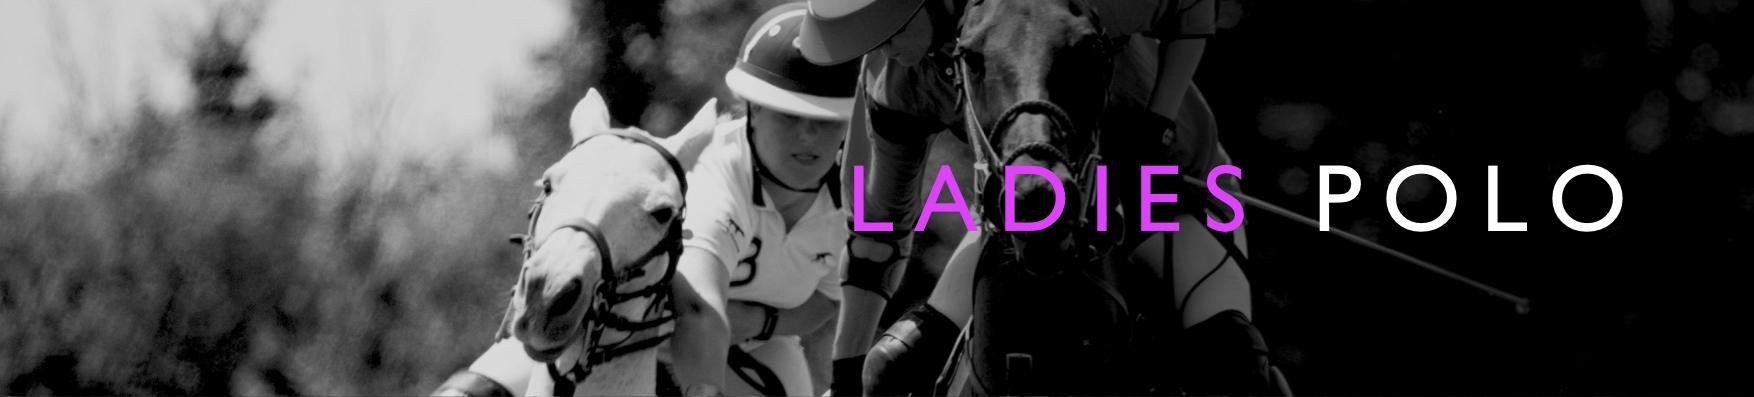 Ladies Polo Banner JPEG.jpg